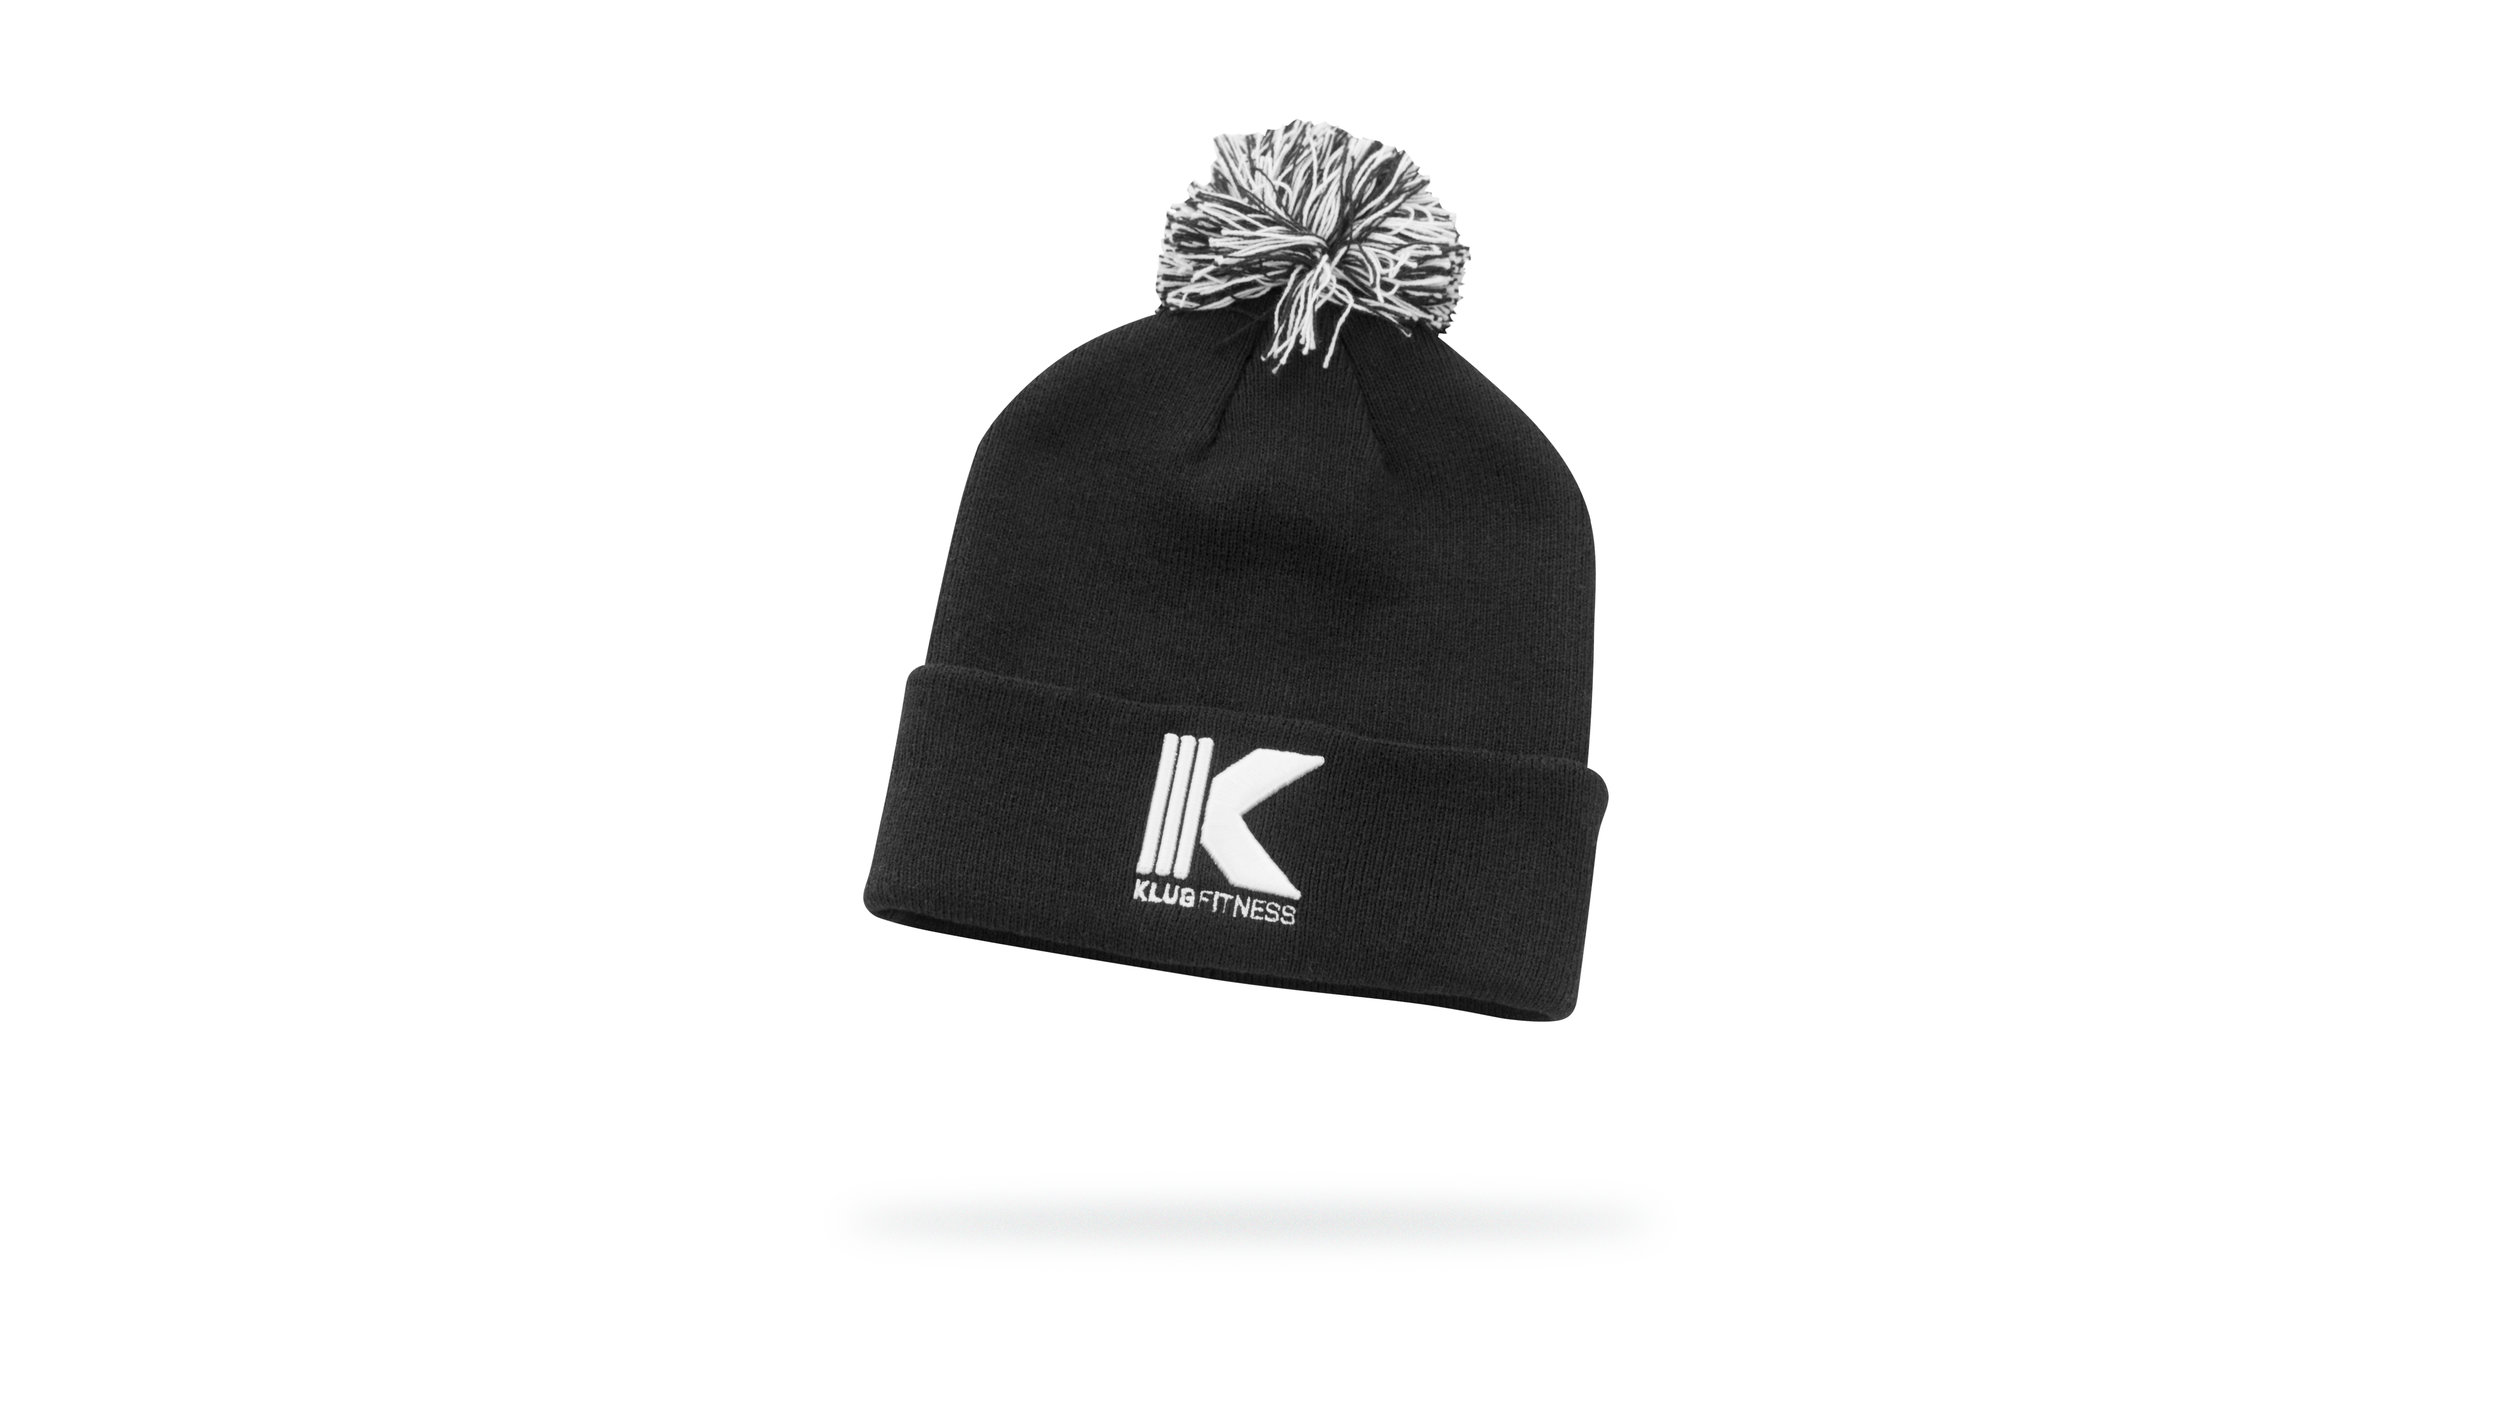 SoftKnit Cotton Winter Cap w/Flip Cuff & 3D embroidered logo